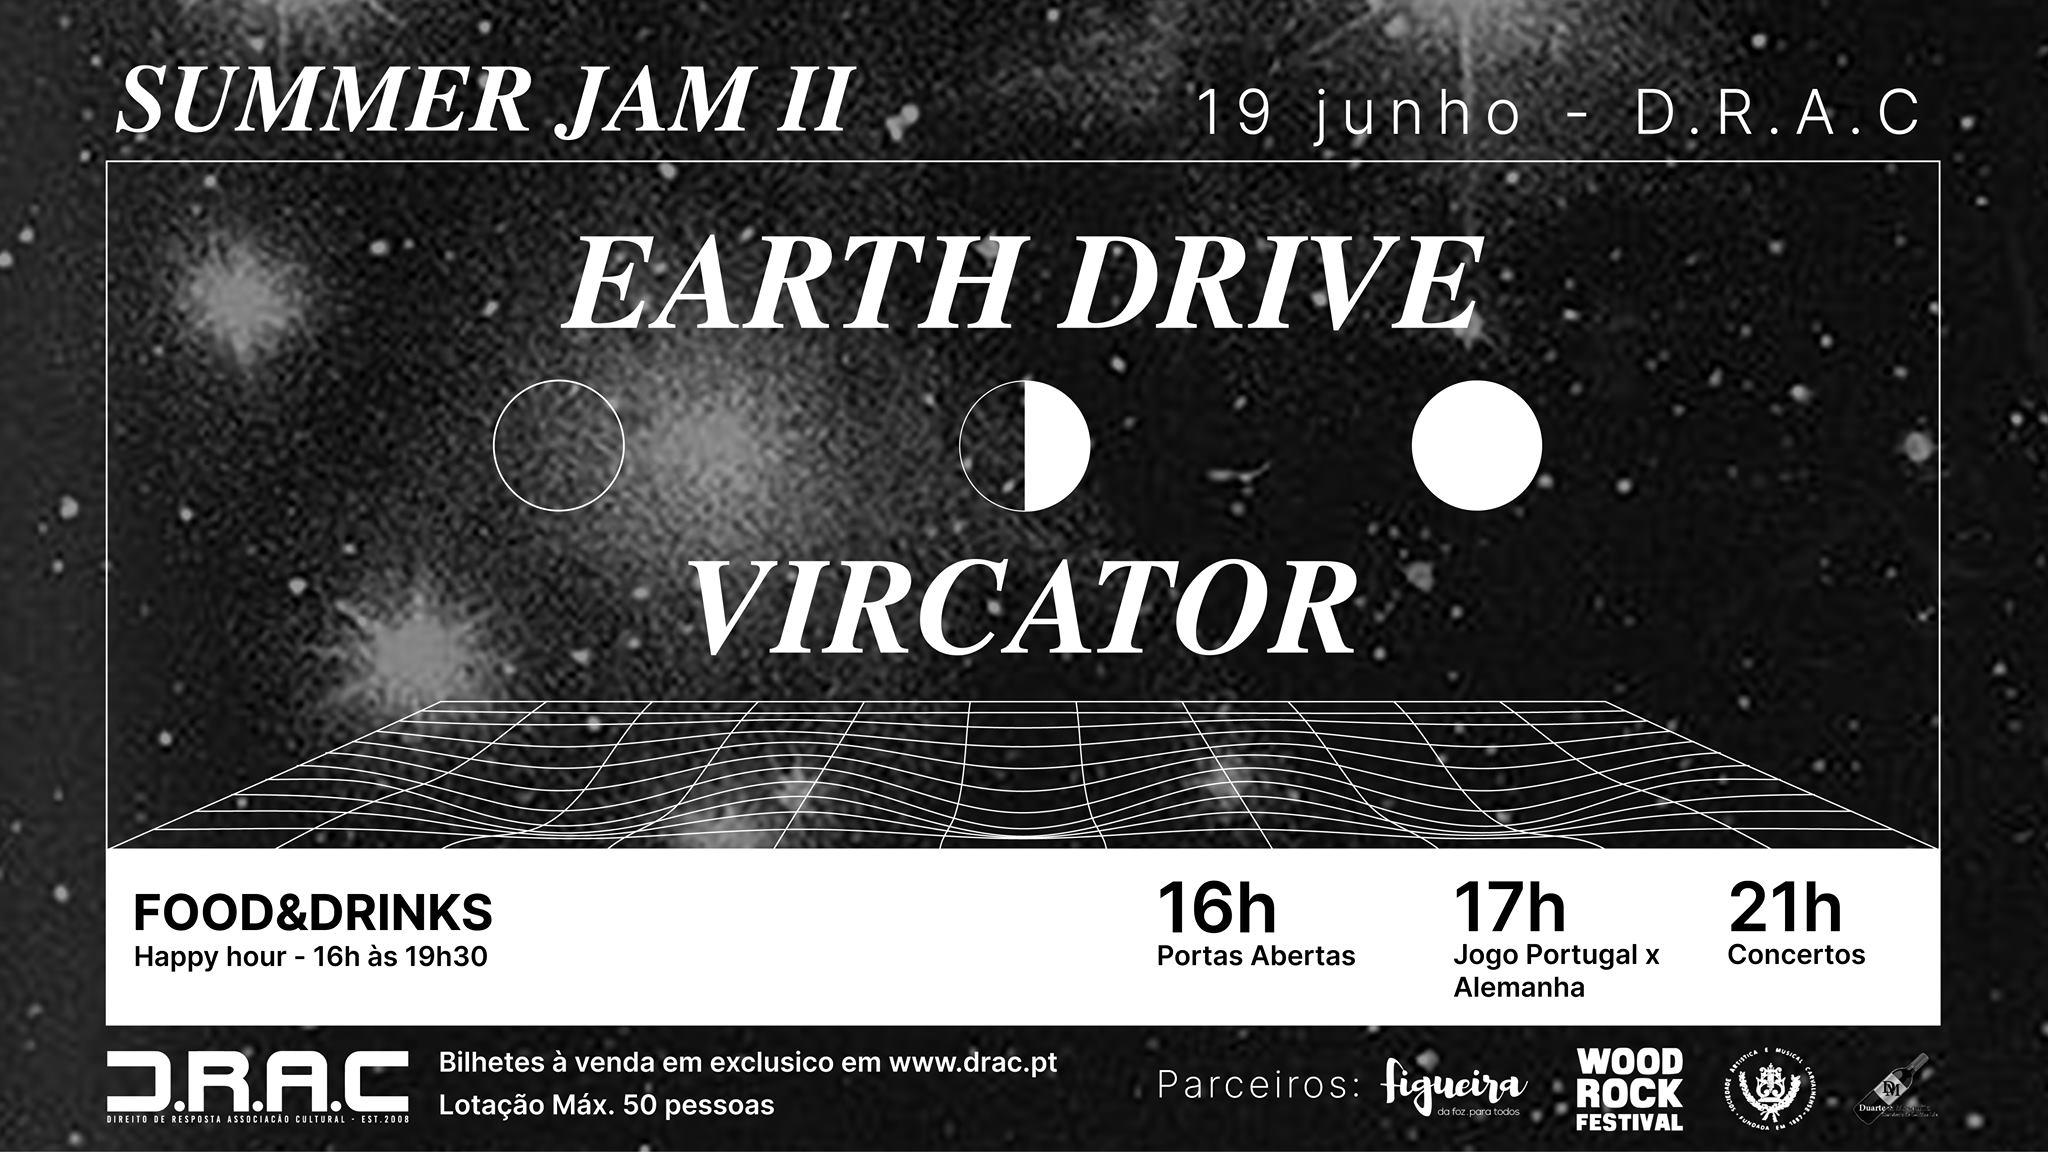 SUMMER JAM II - EARTH DRIVE + VIRCATOR